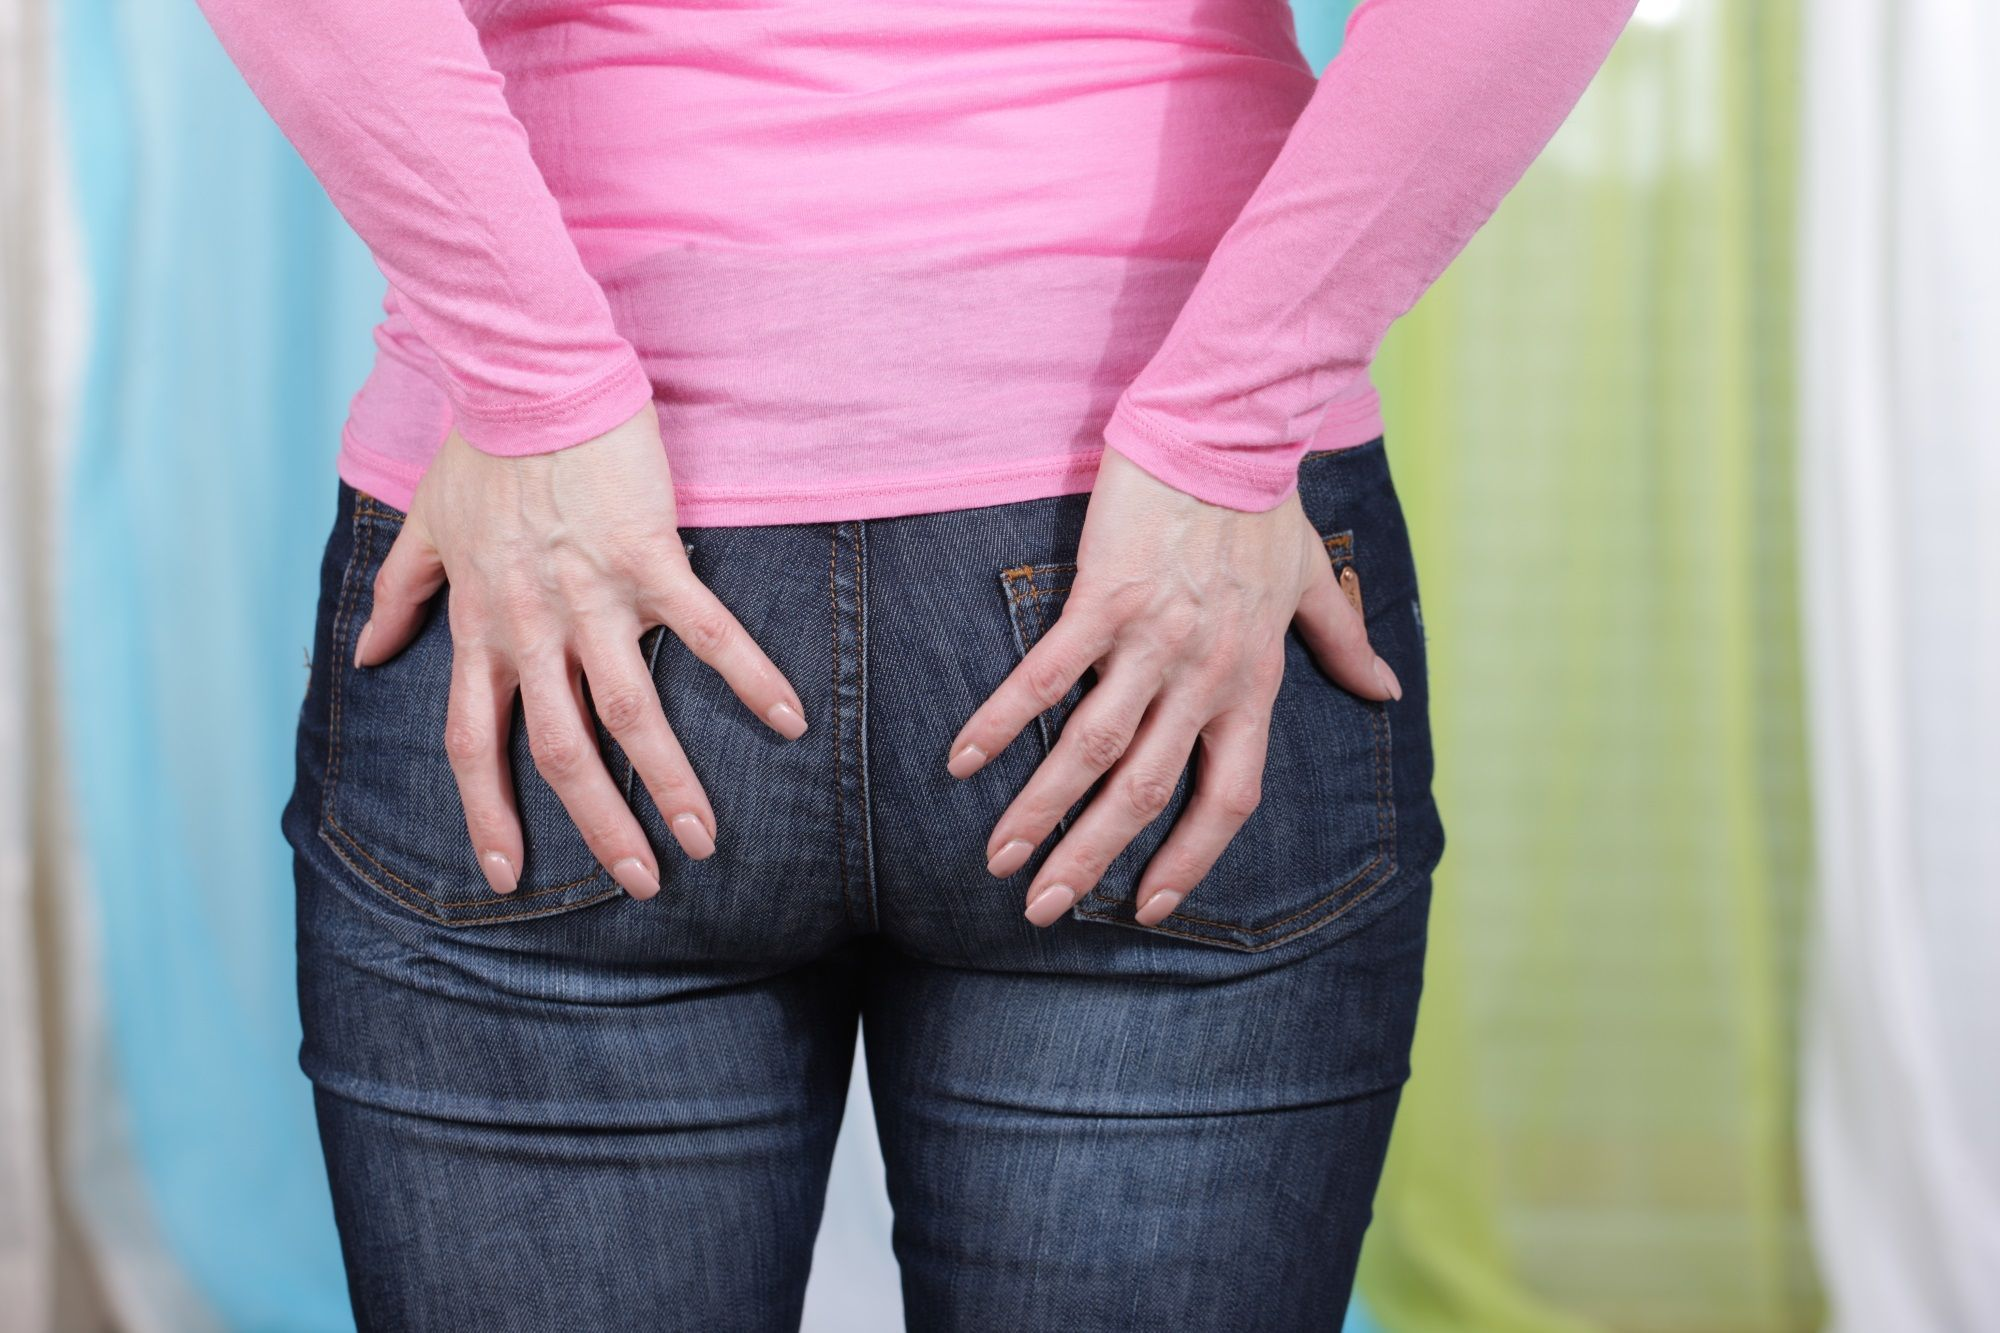 symptome hemoroide demangeaison